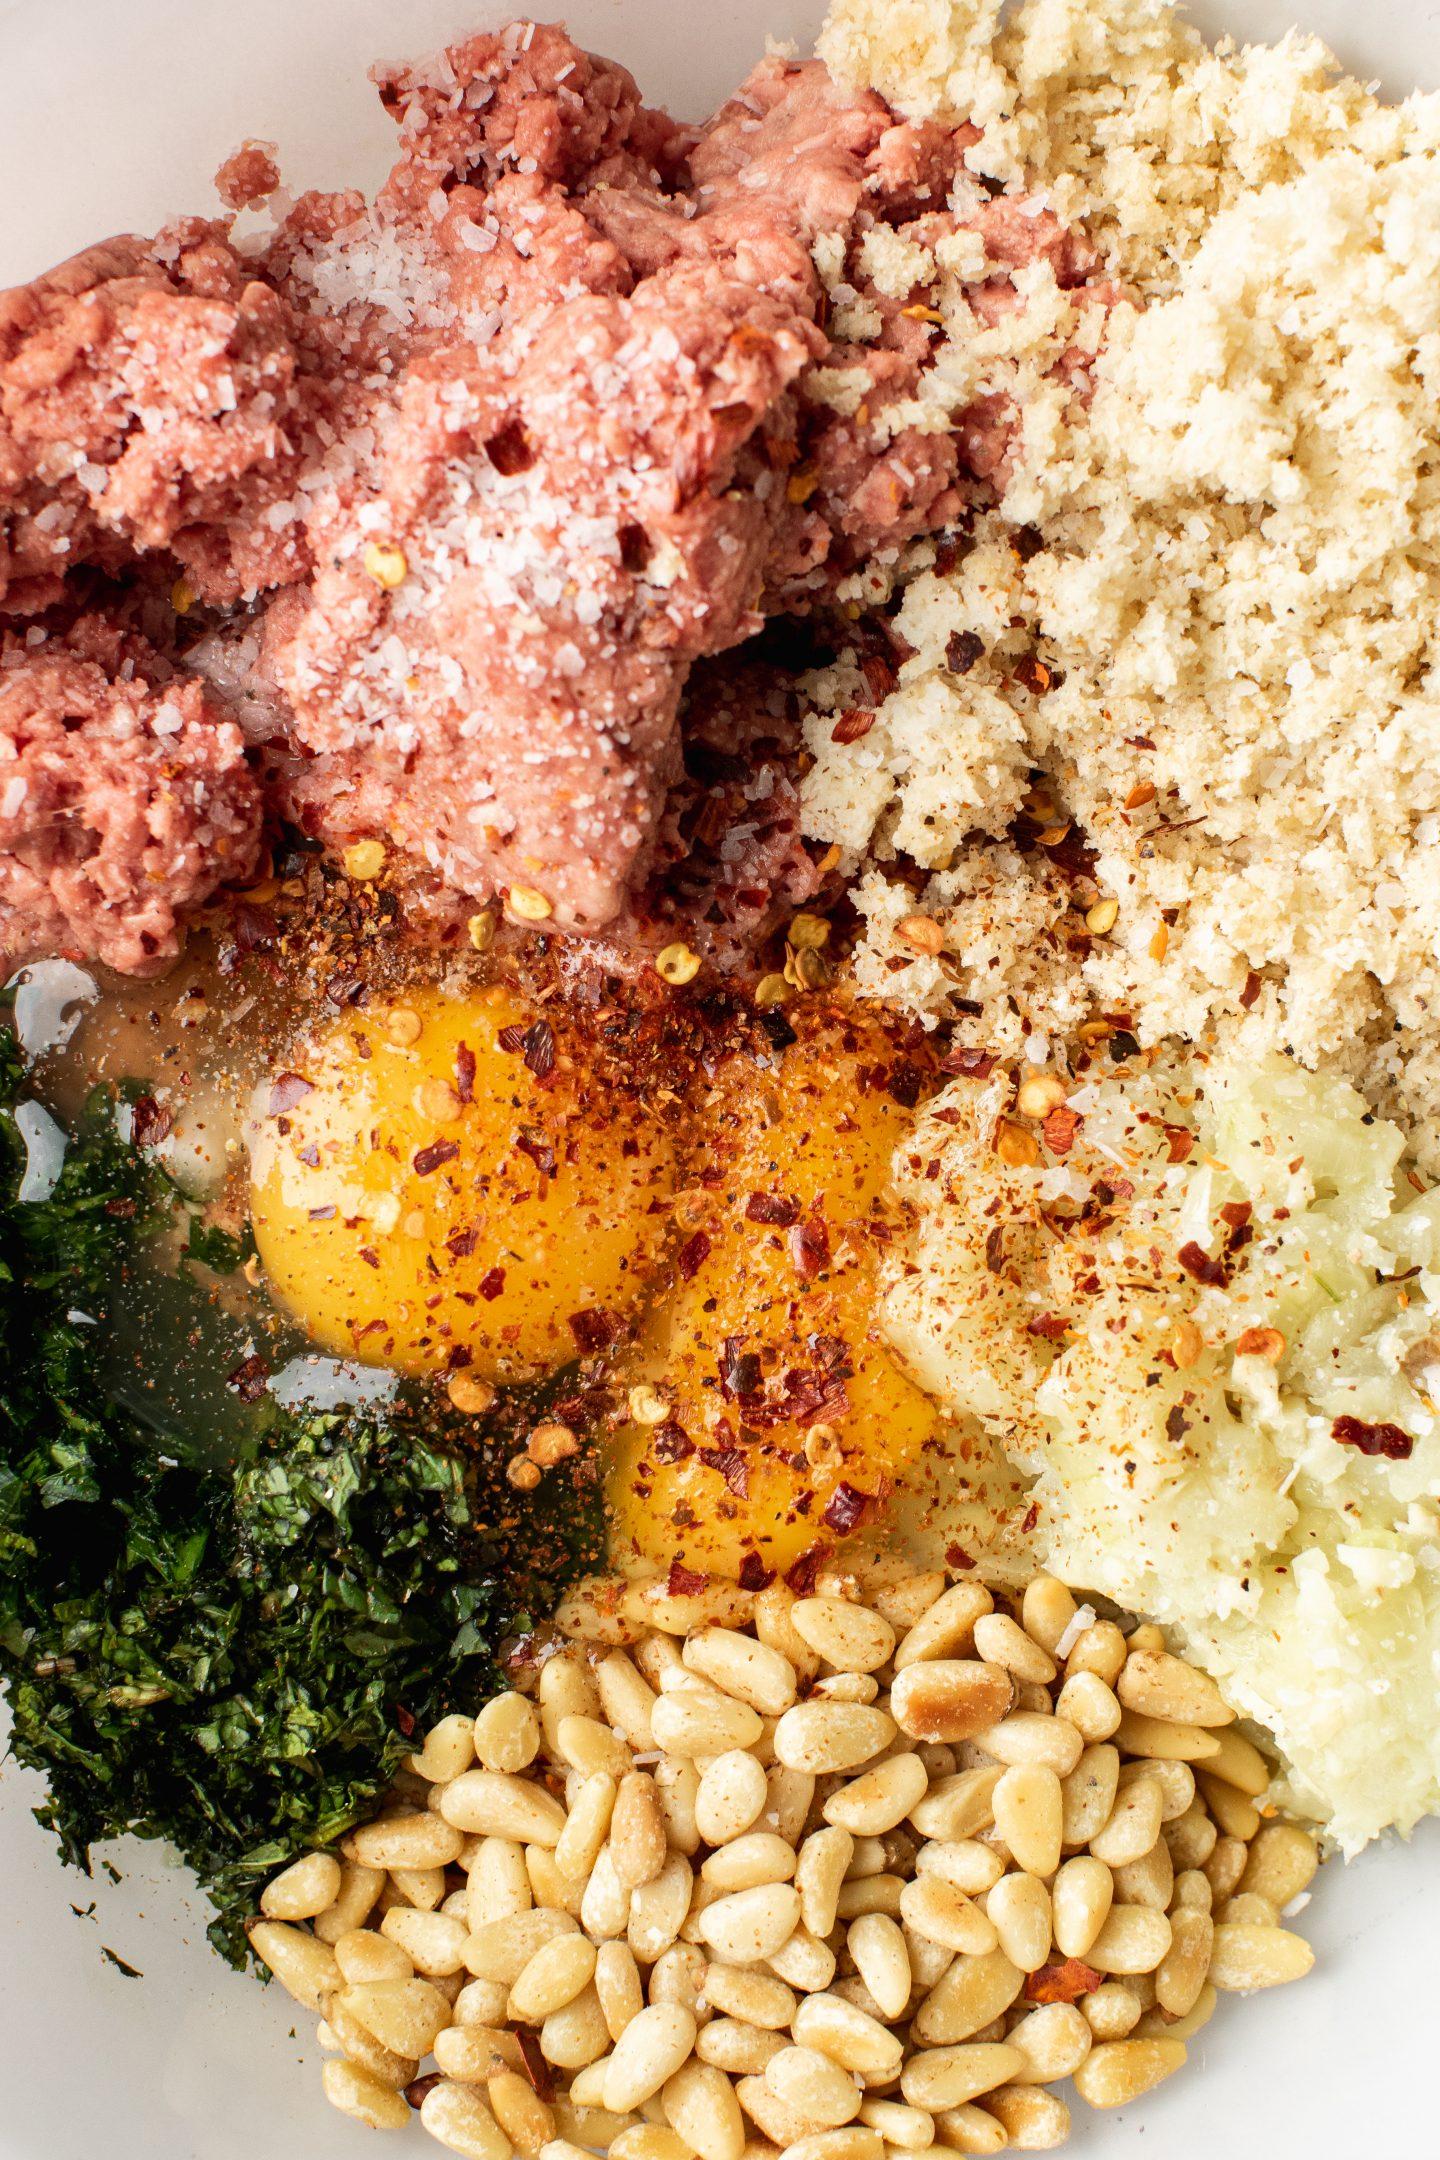 Ingredients for lamb meatballs